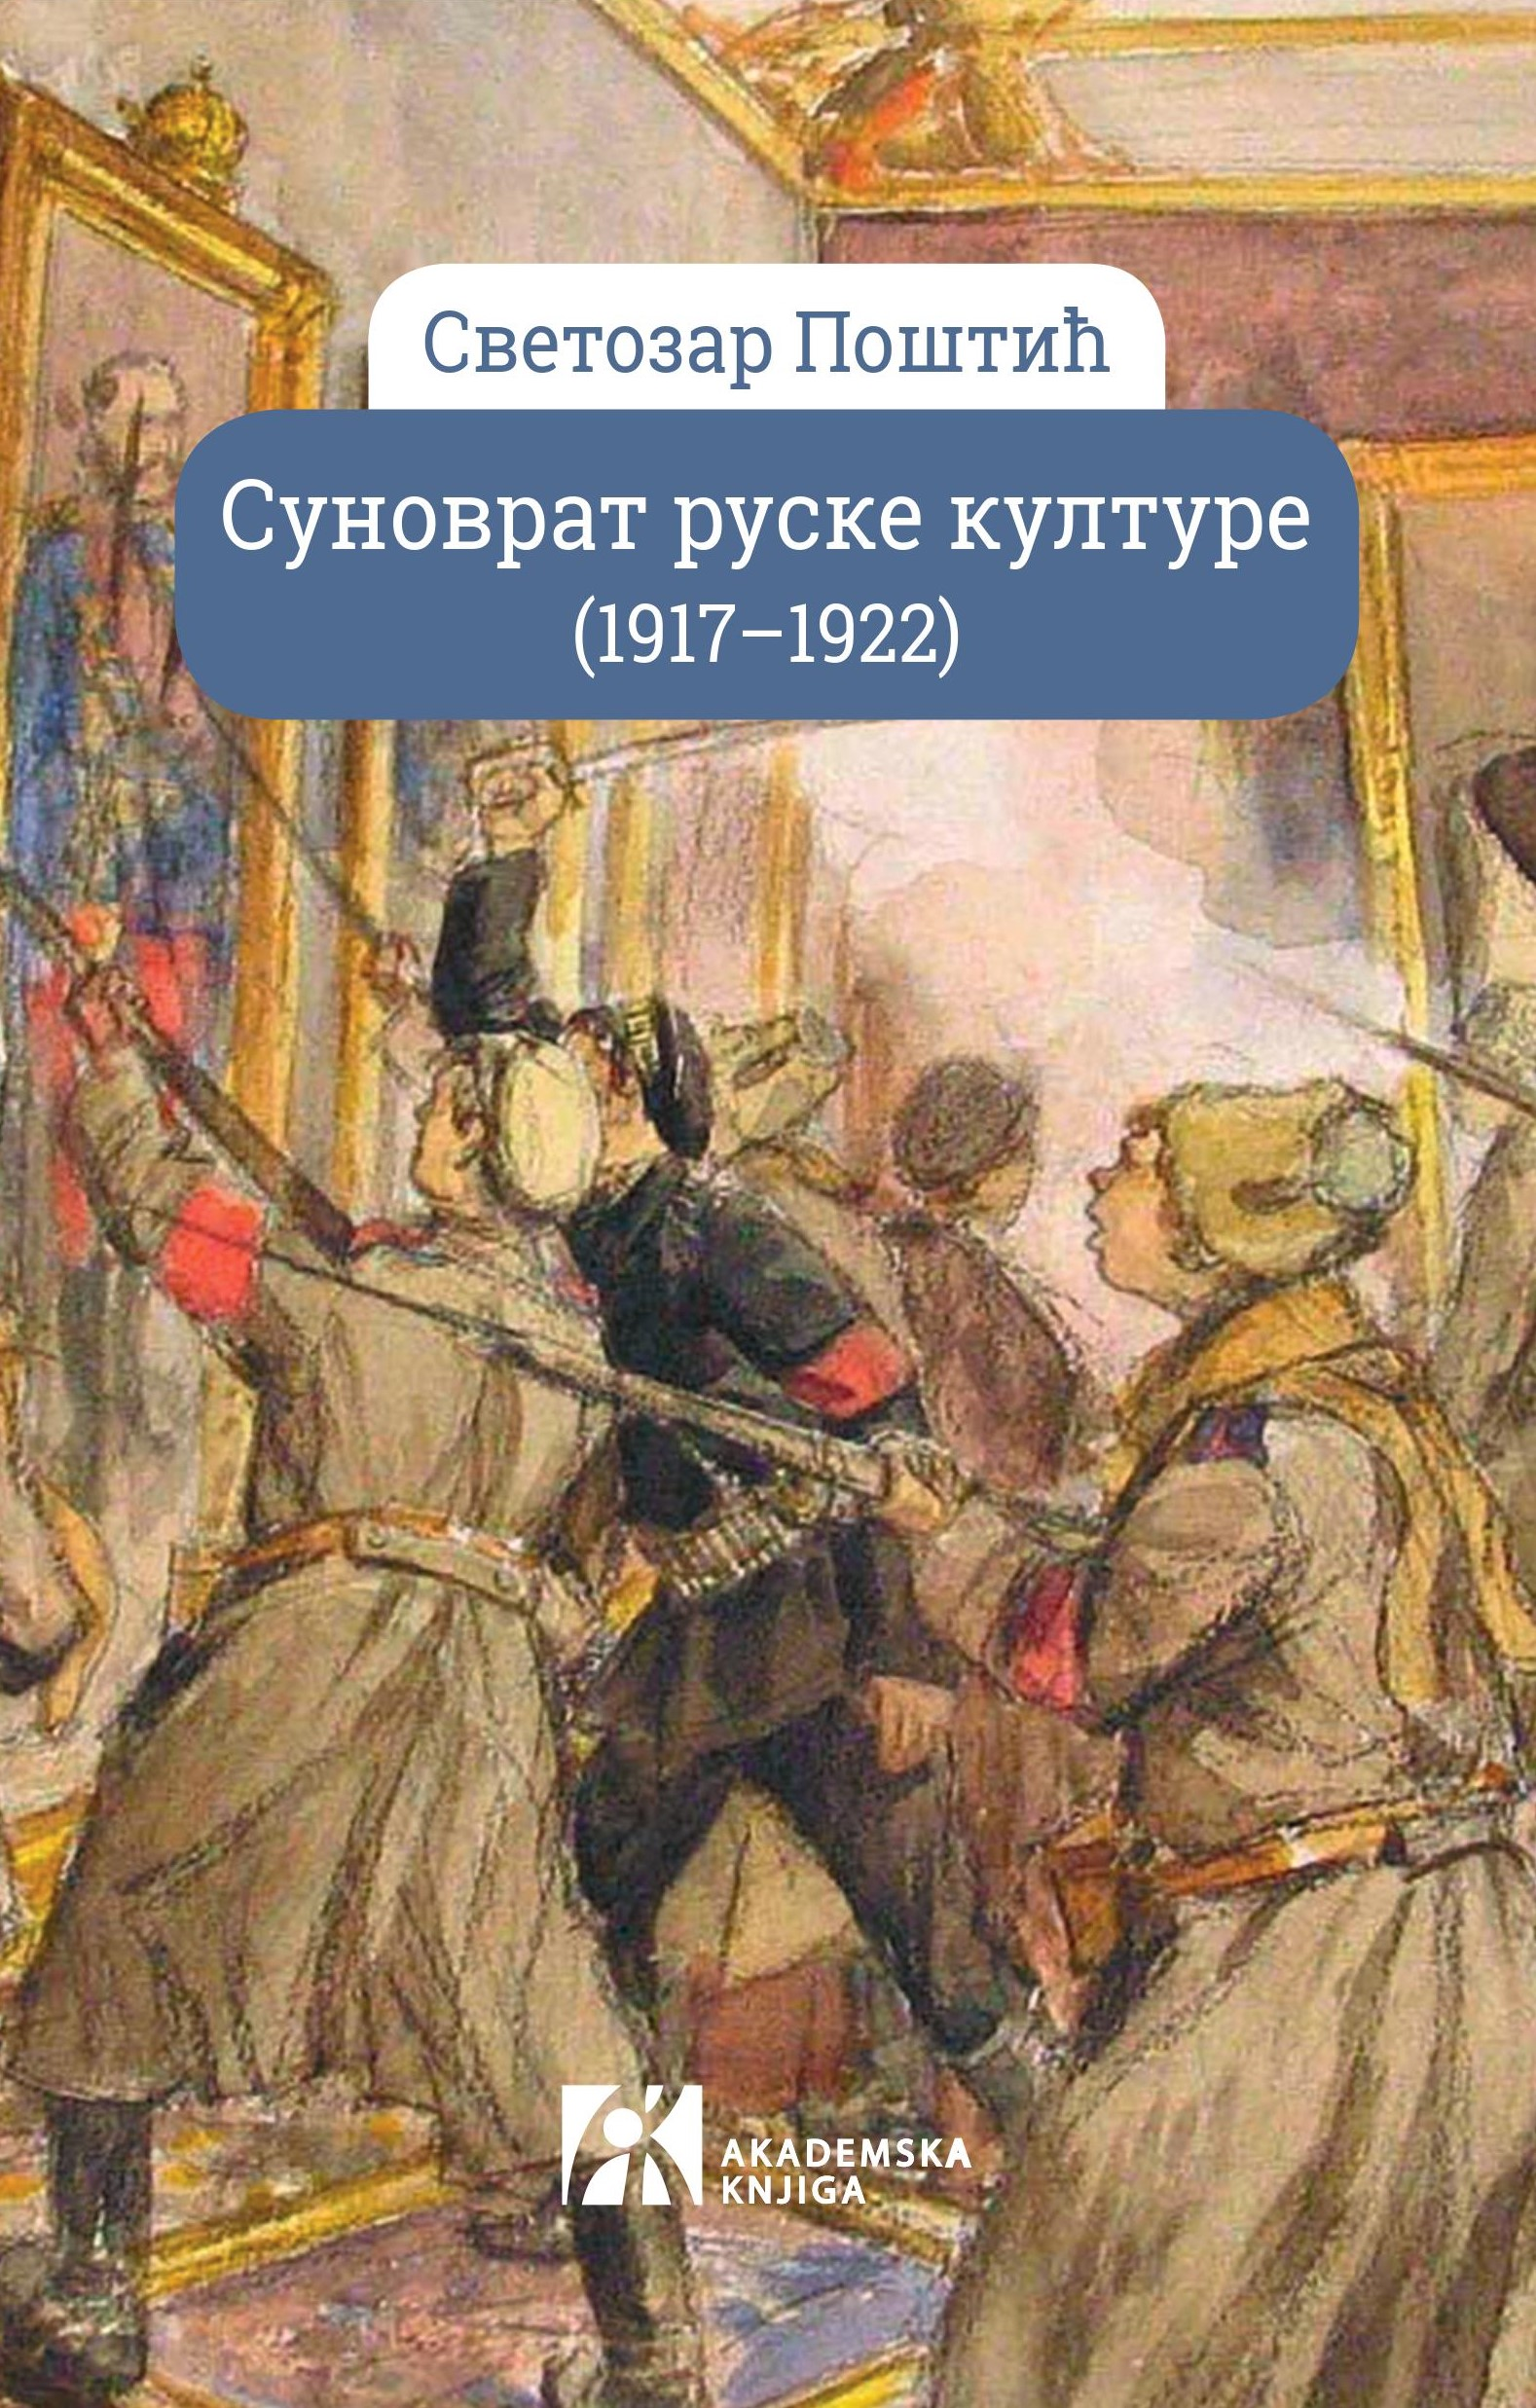 SUNOVRAT RUSKE KULTURE <br/> (1917-1922)